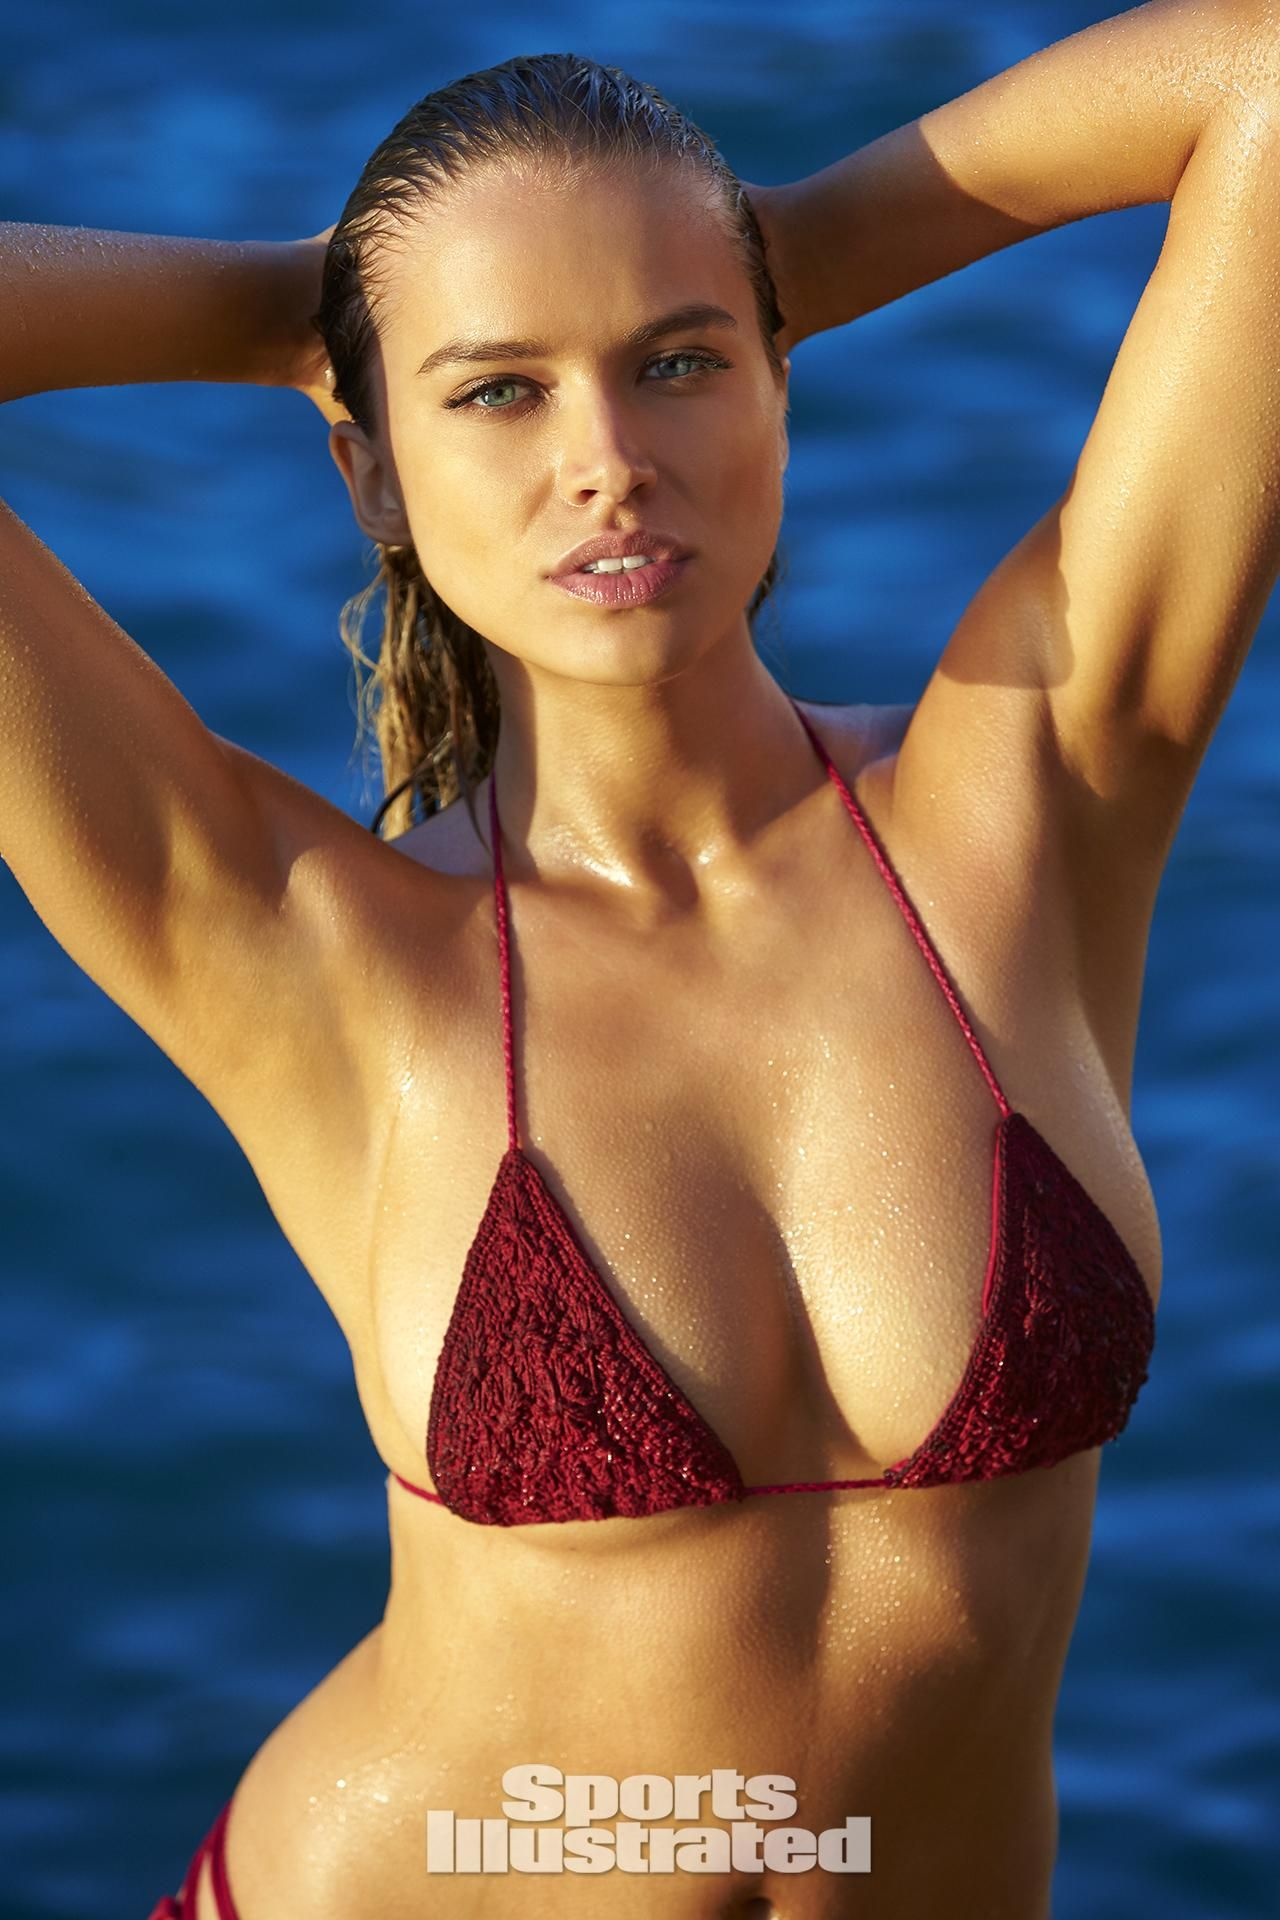 Bikini Tania Marie Caringi naked (46 foto and video), Topless, Fappening, Feet, cameltoe 2015